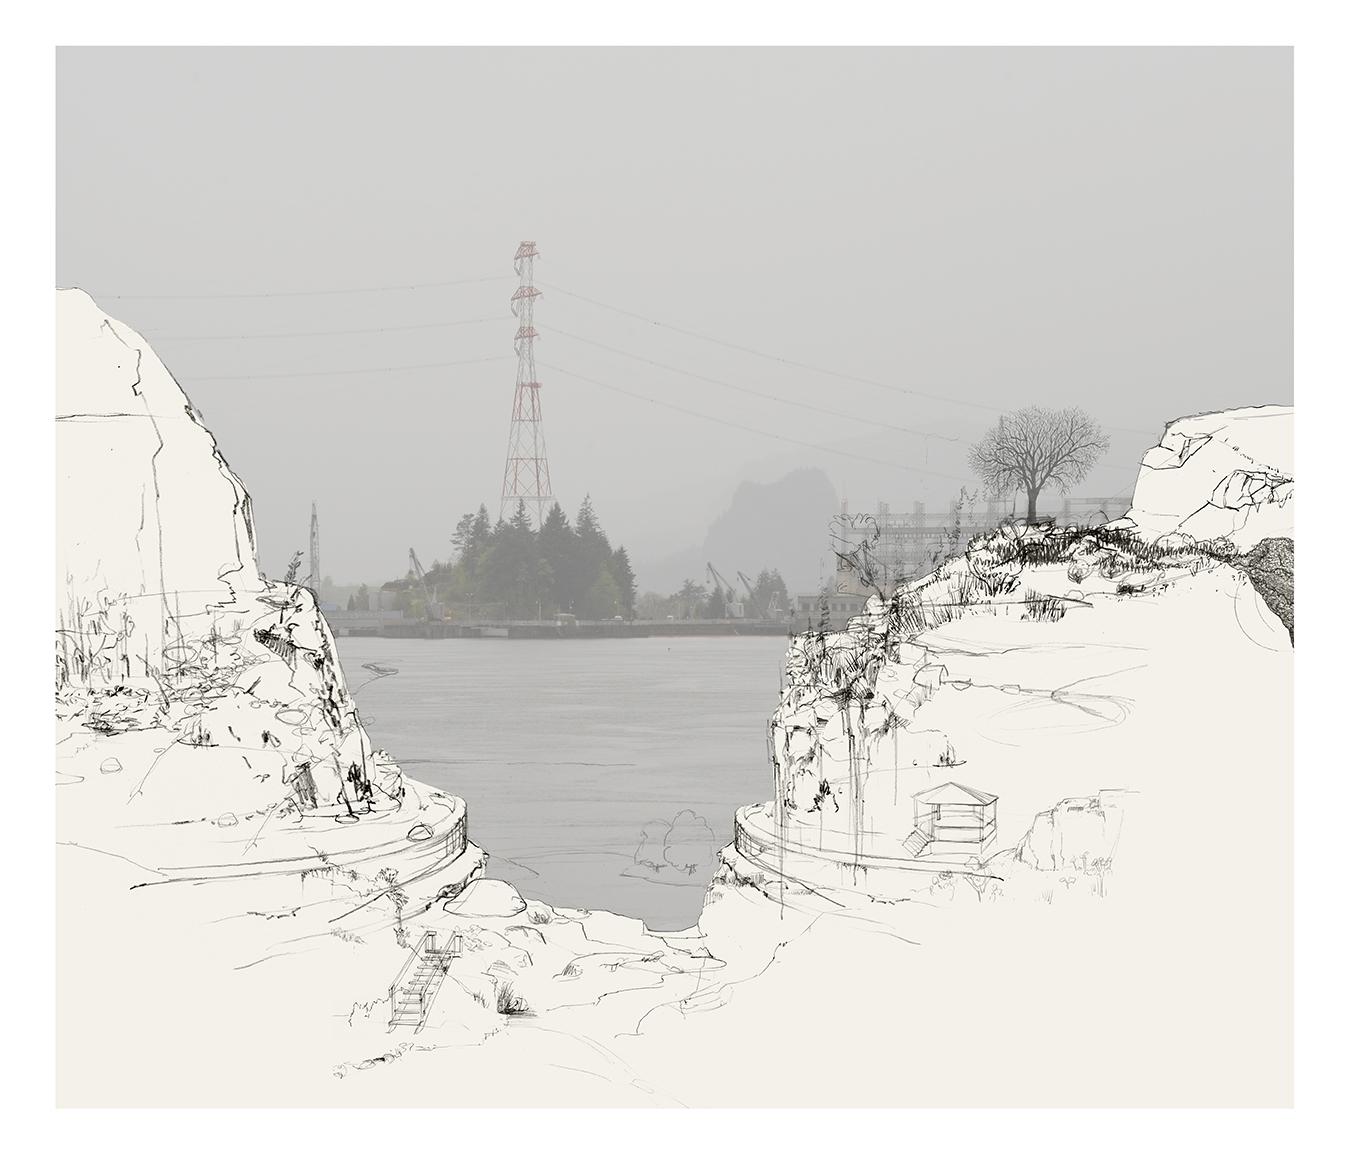 John Holmgren & Nick Conbere mixed-media prints